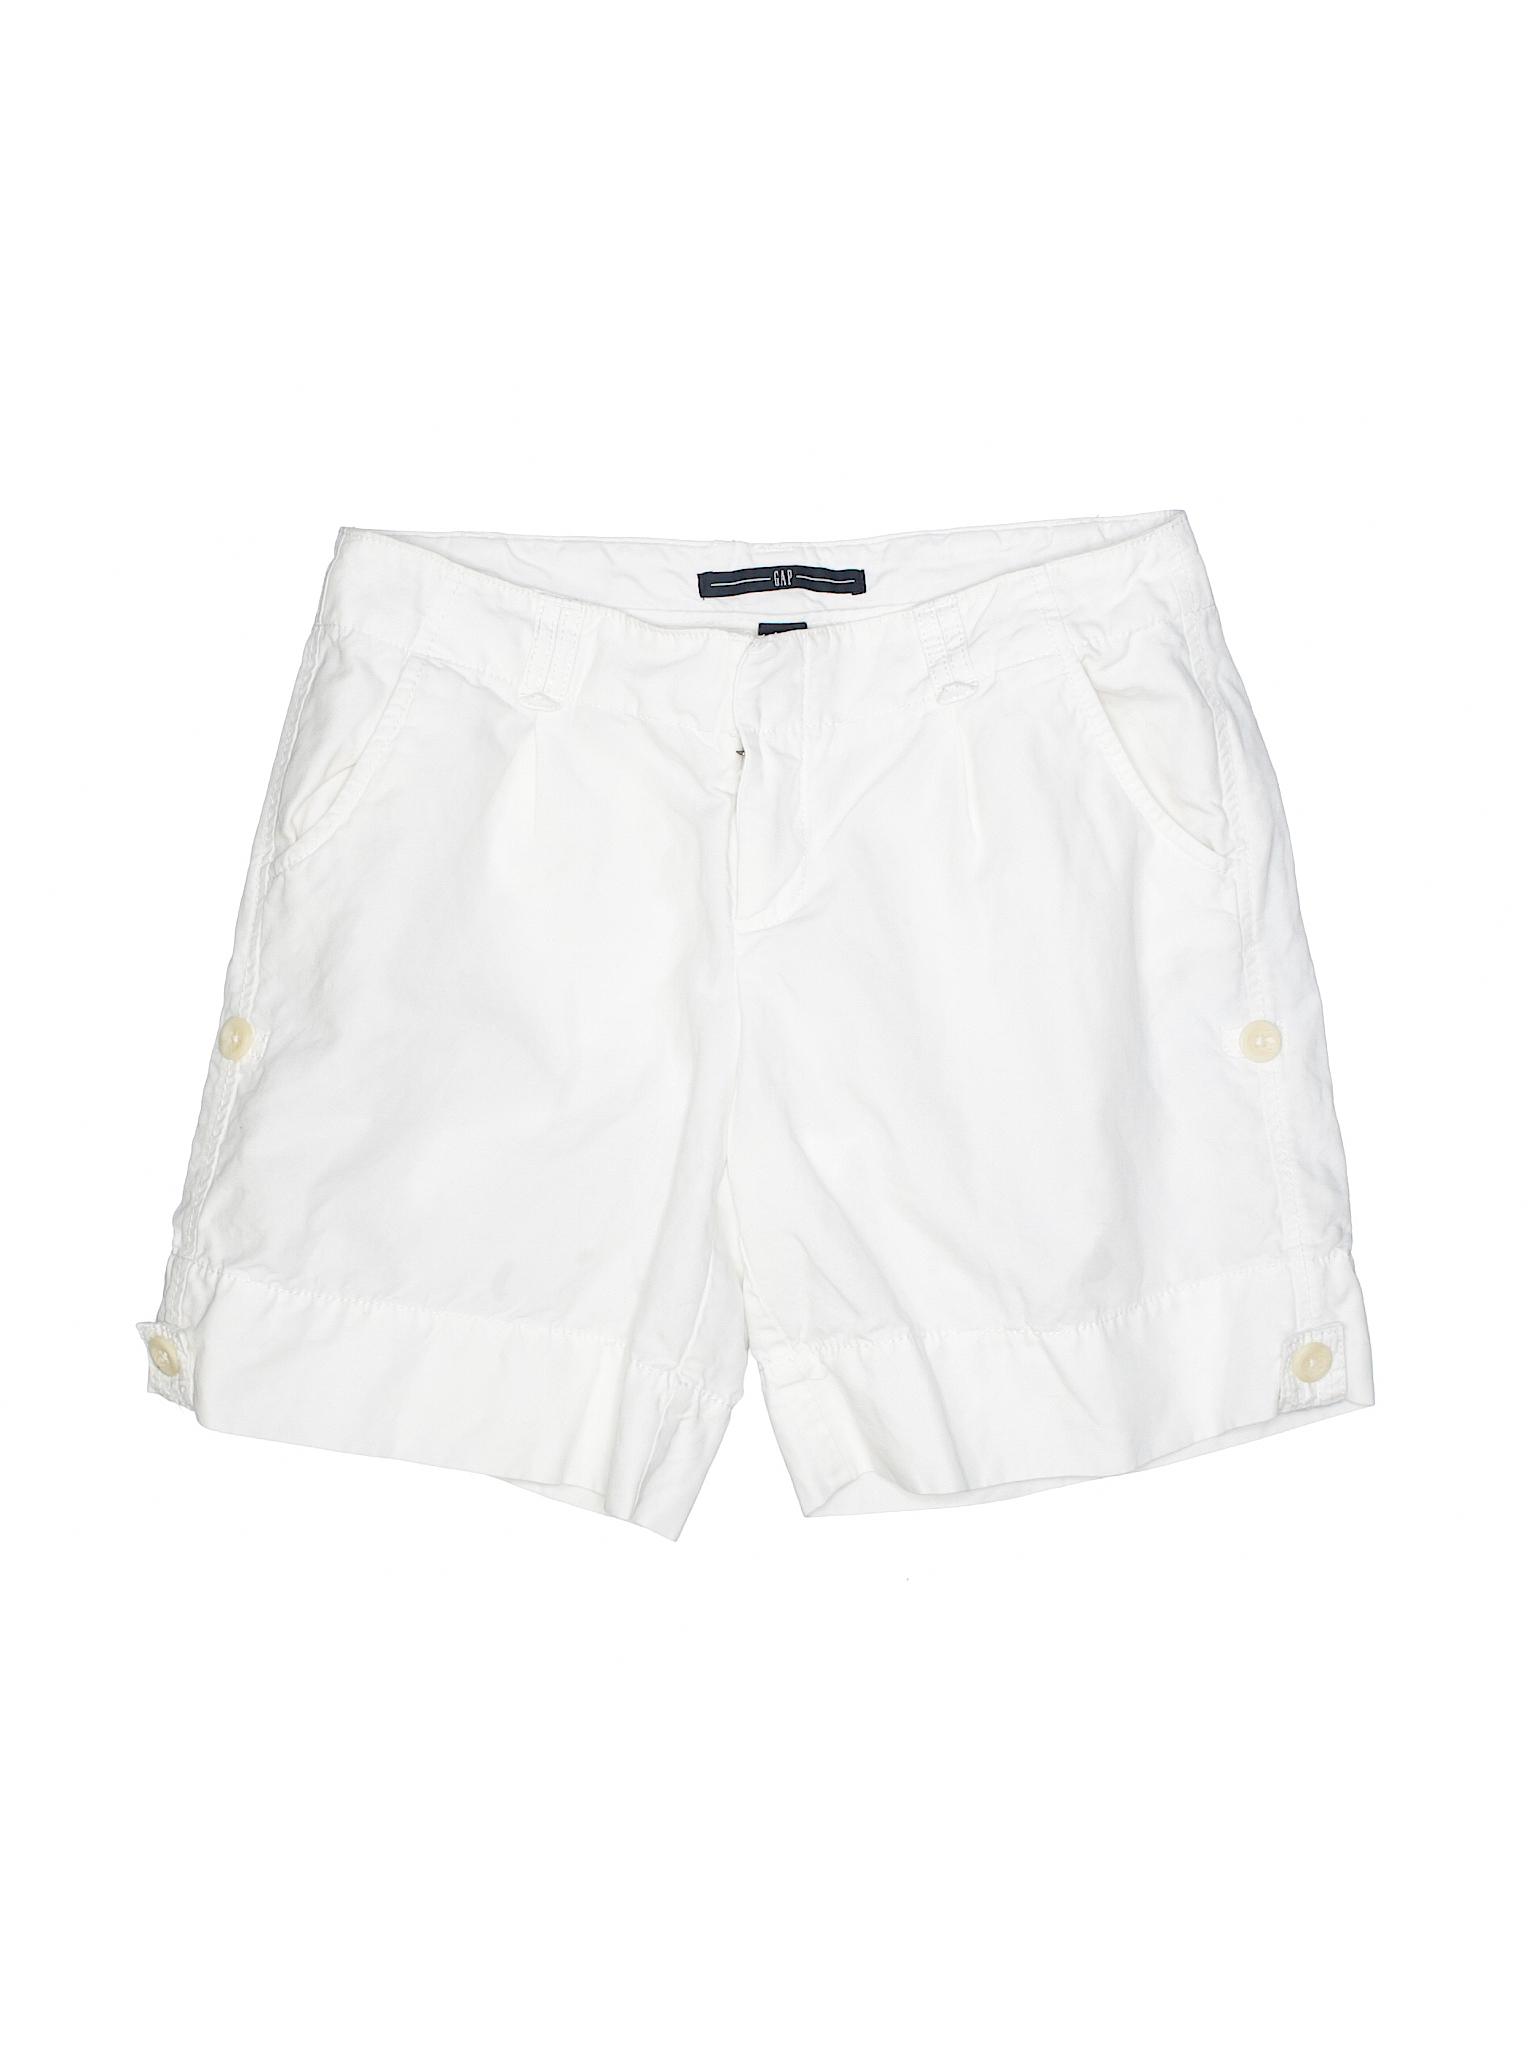 Khaki Khaki Boutique Khaki Gap Shorts Boutique Boutique Boutique Khaki Shorts Shorts Boutique Gap Gap Shorts Gap gwqaBPax